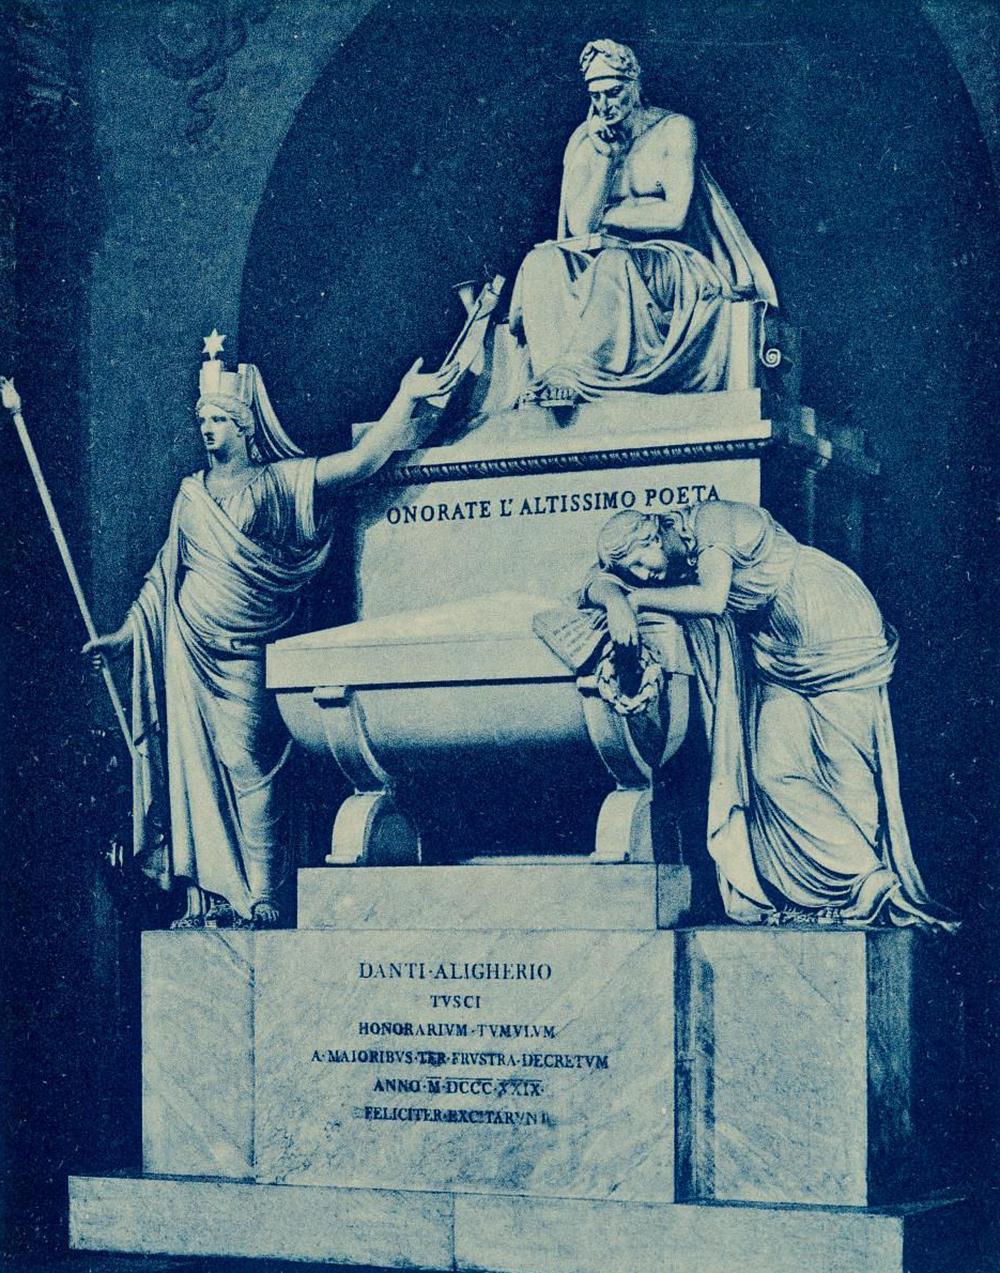 Dante Alighieri monument. Photograph by the Fratelli Alinari. Museum of Fine Arts, Boston, gift of Sylvester Rosa Koehler.